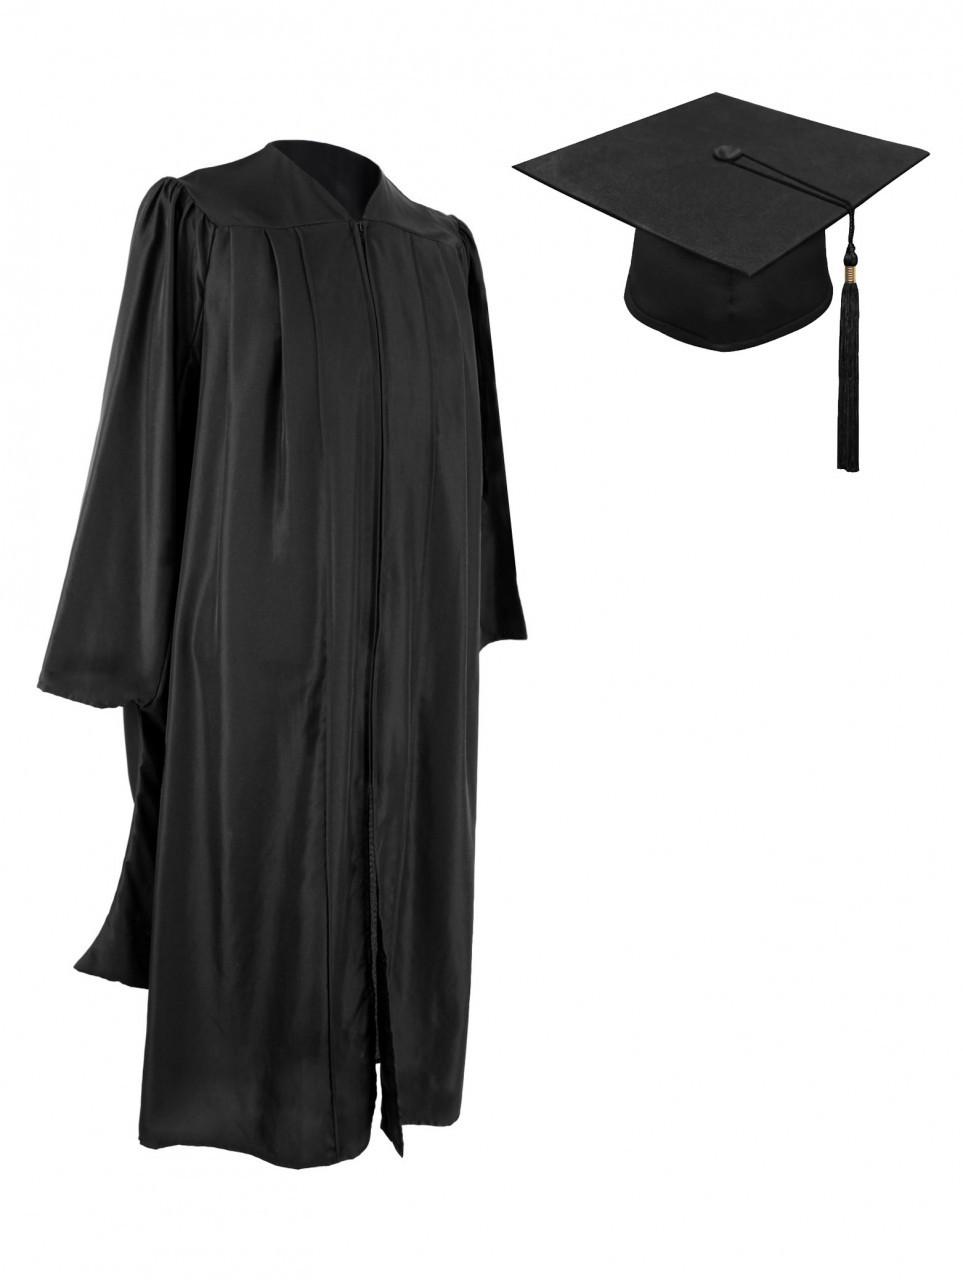 4d5e4c578ca MASTER FREEDOM™ Gown, Cap & Tassel - Willsie Cap & Gown